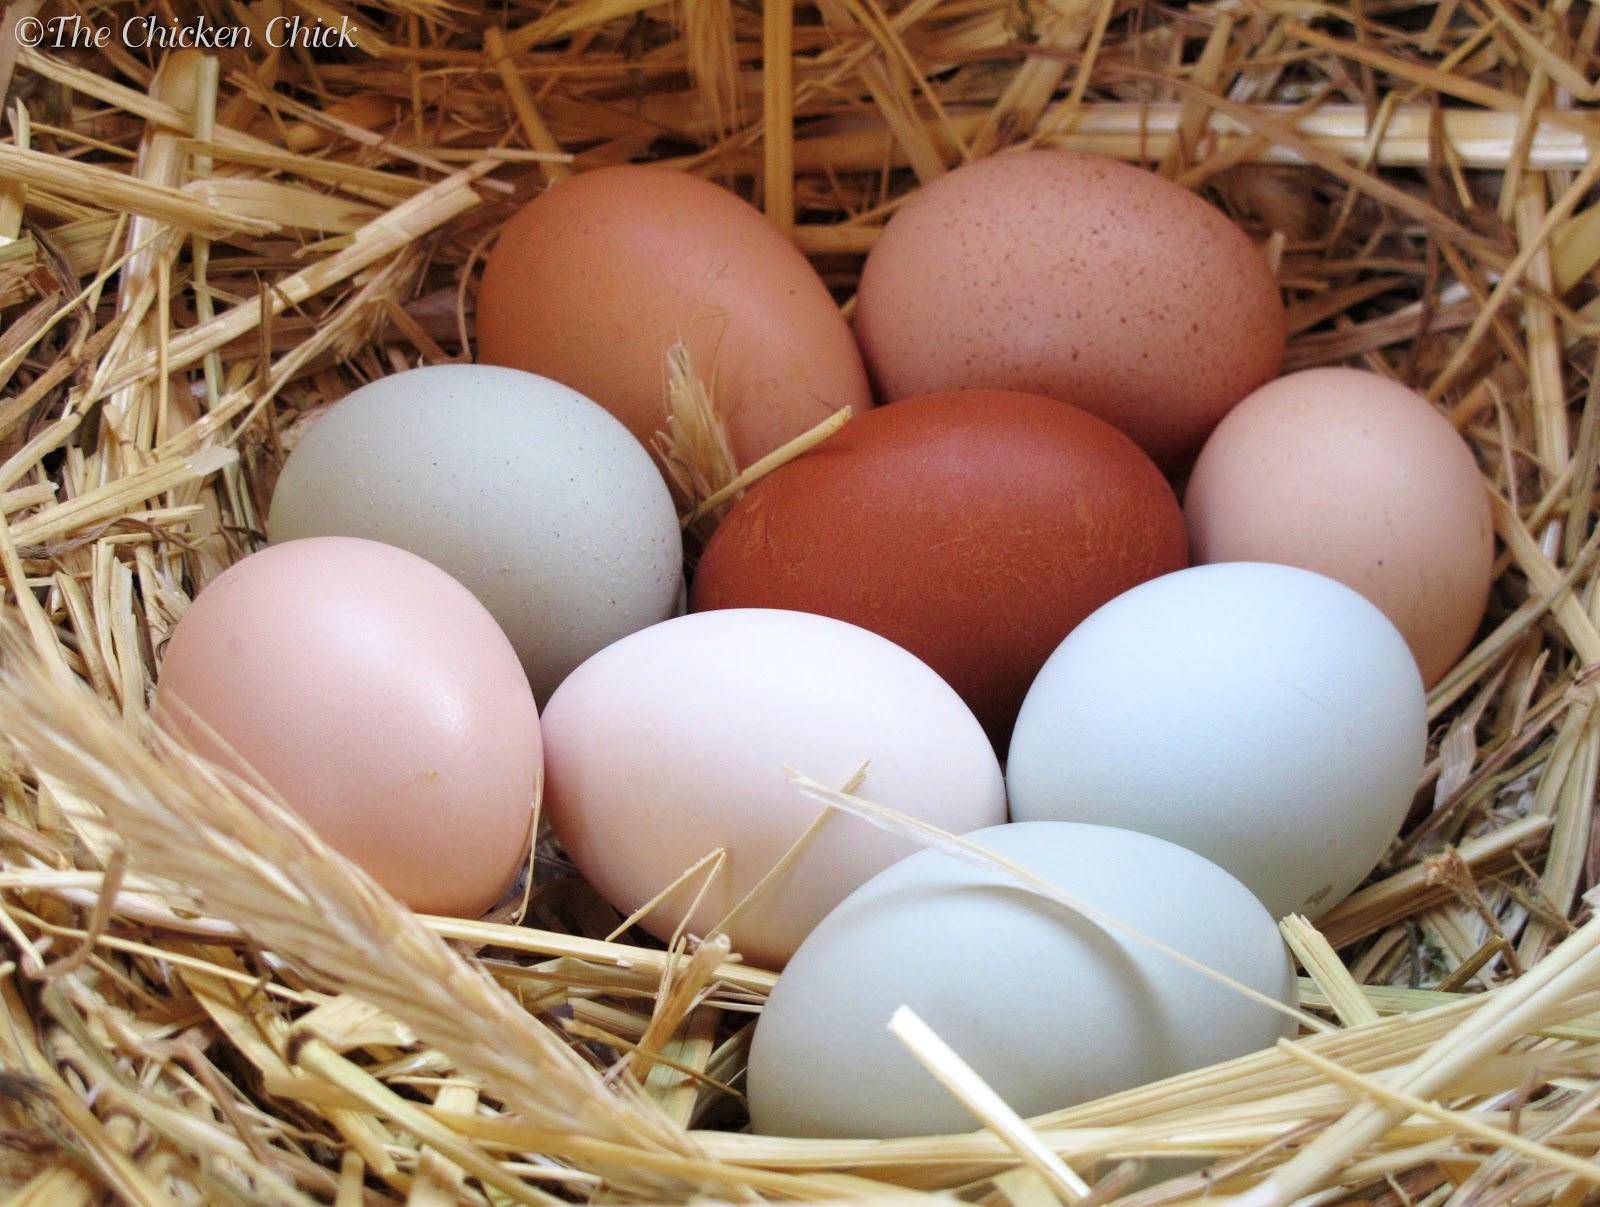 backyard chicken eggs with image bwhiteballard storify